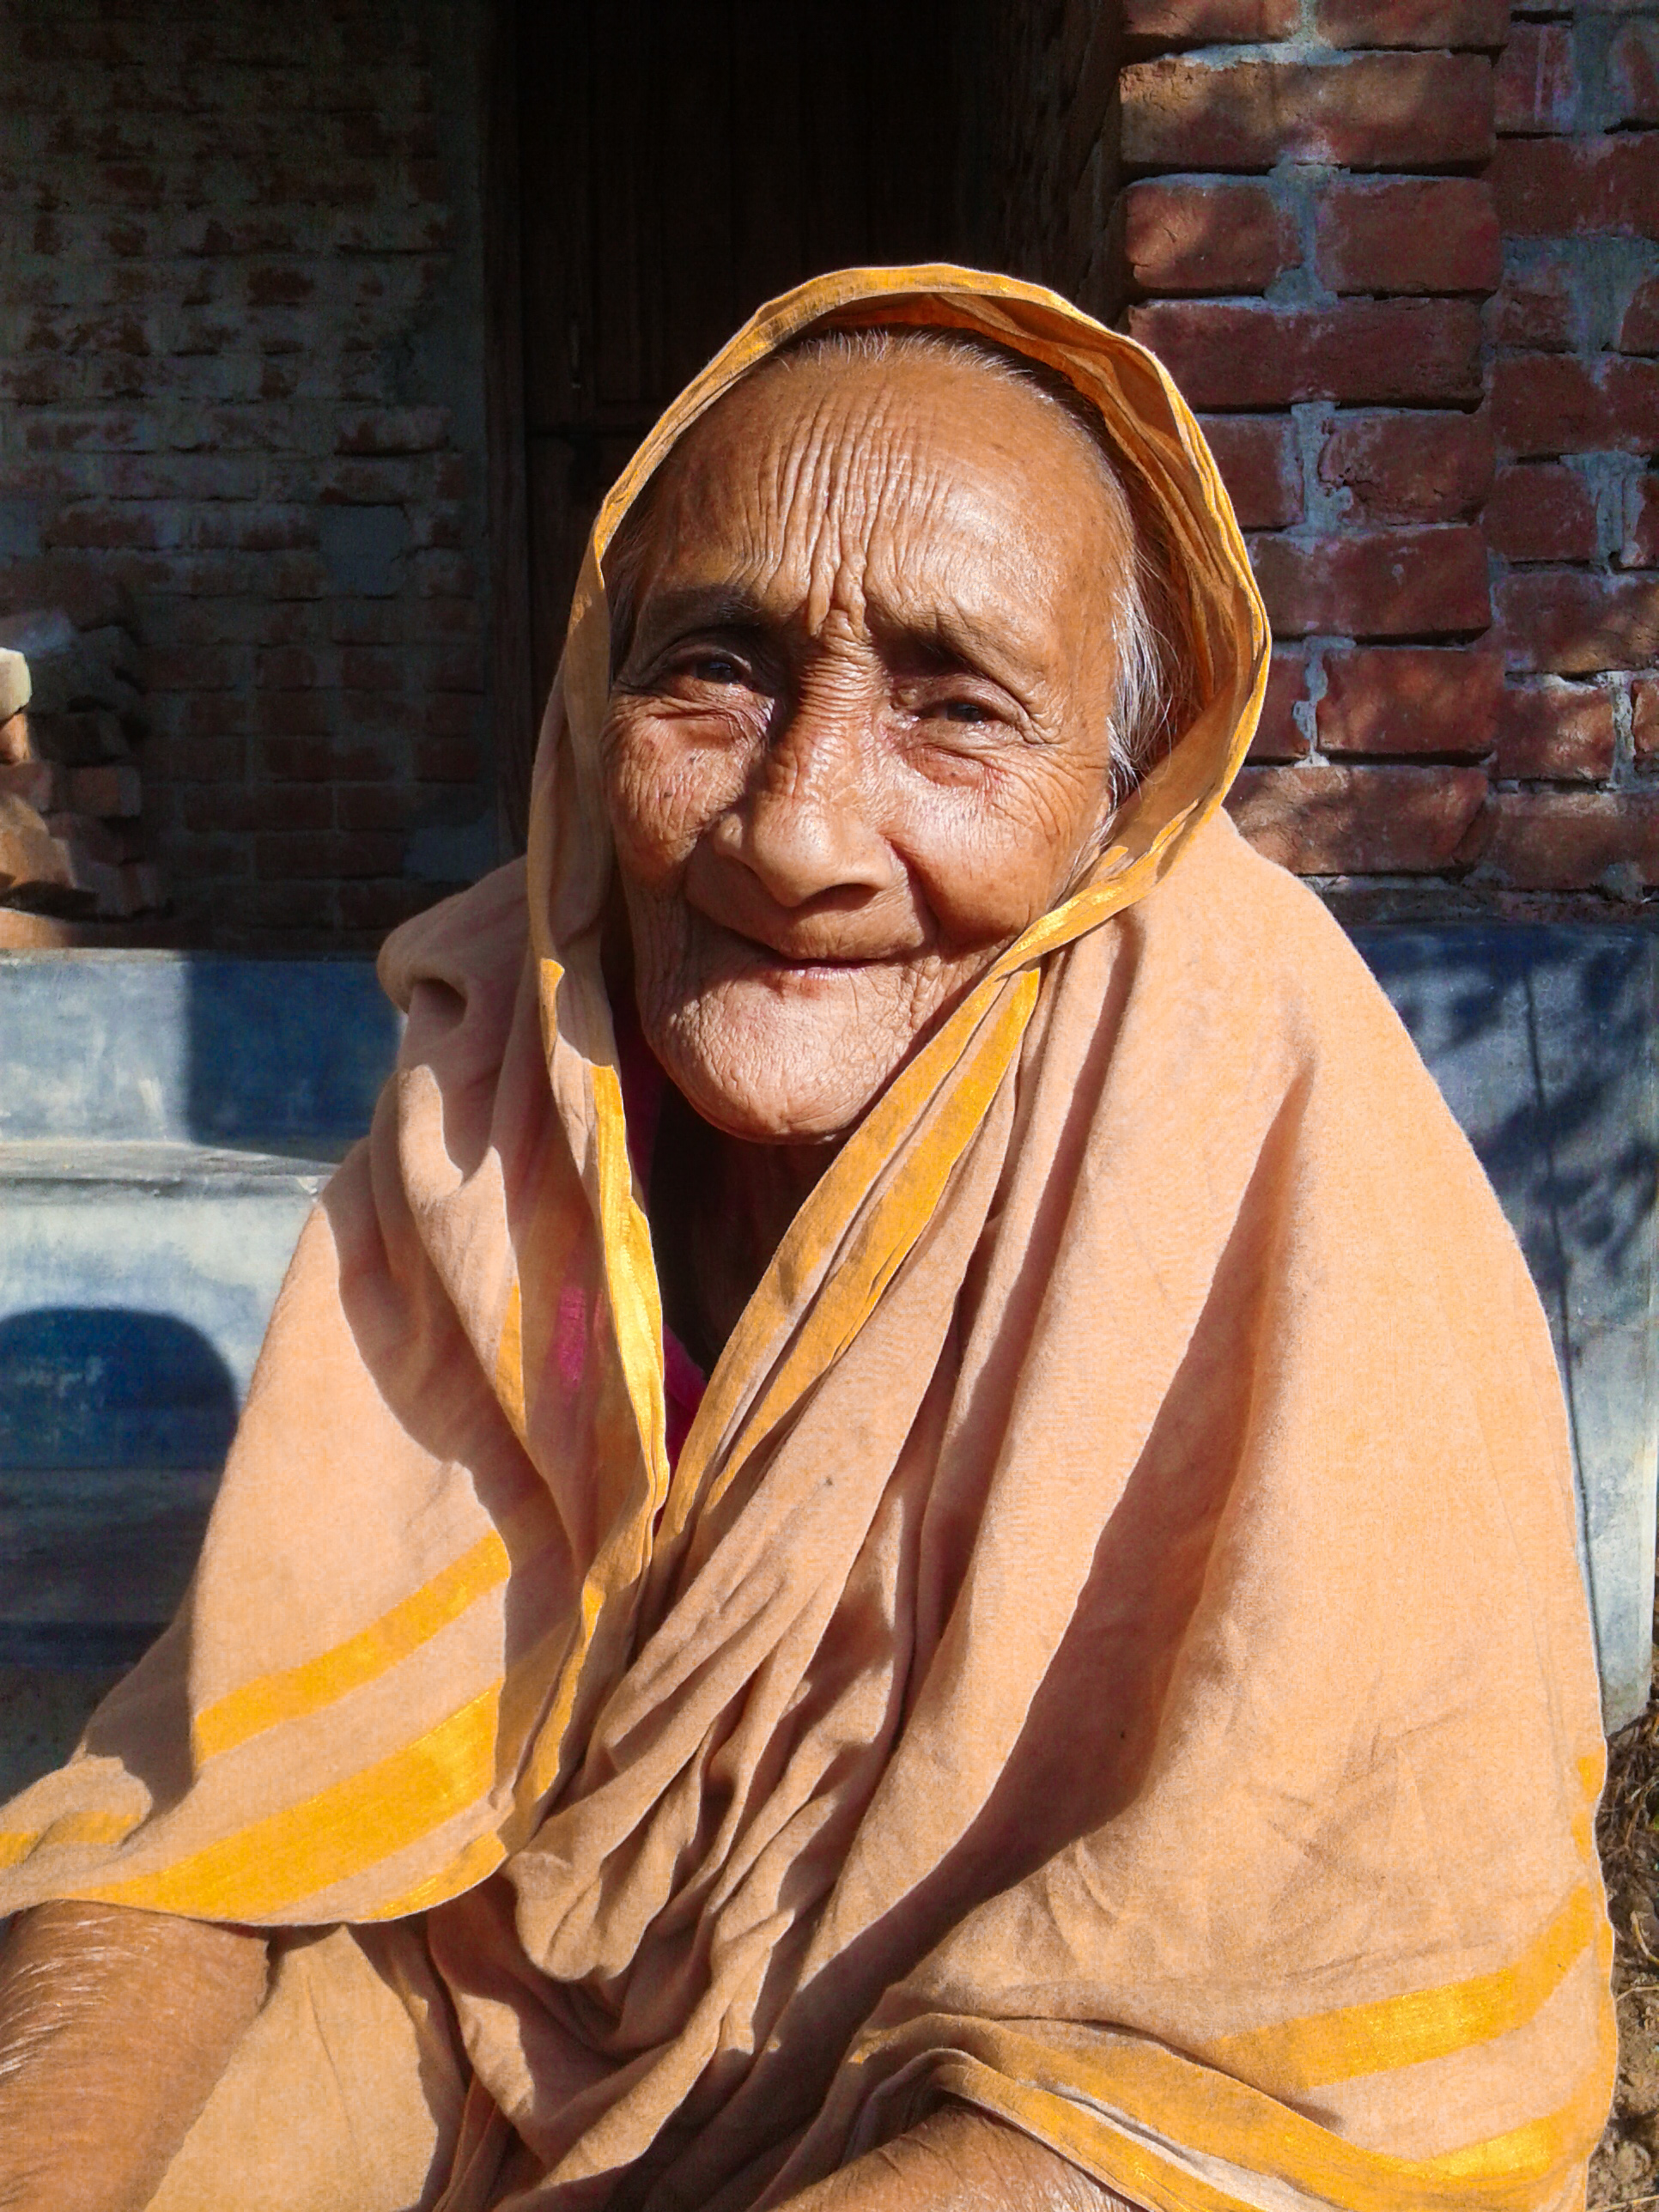 Filean Old Granny 2Jpg - Wikimedia Commons-3102